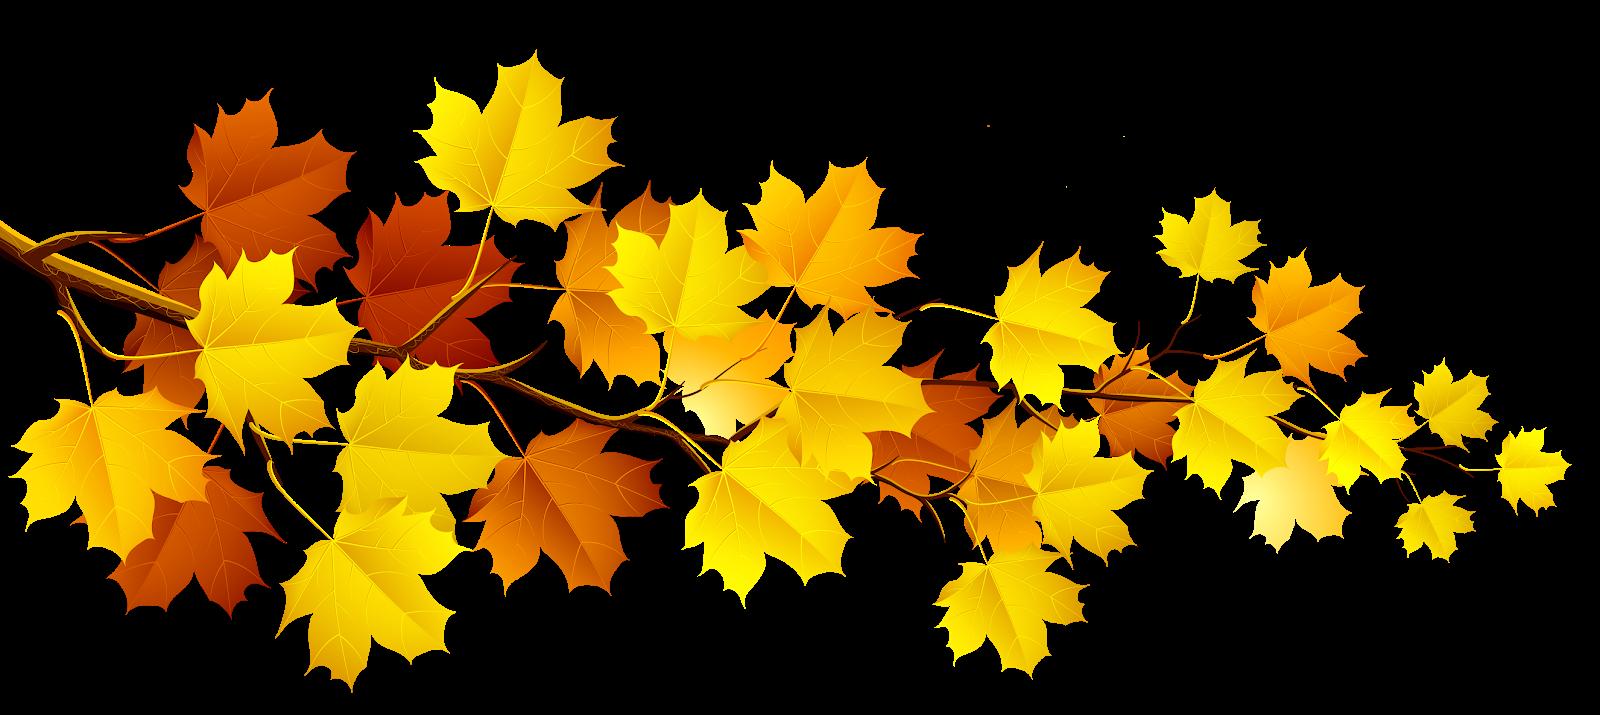 free autumn clipart lines - photo #15